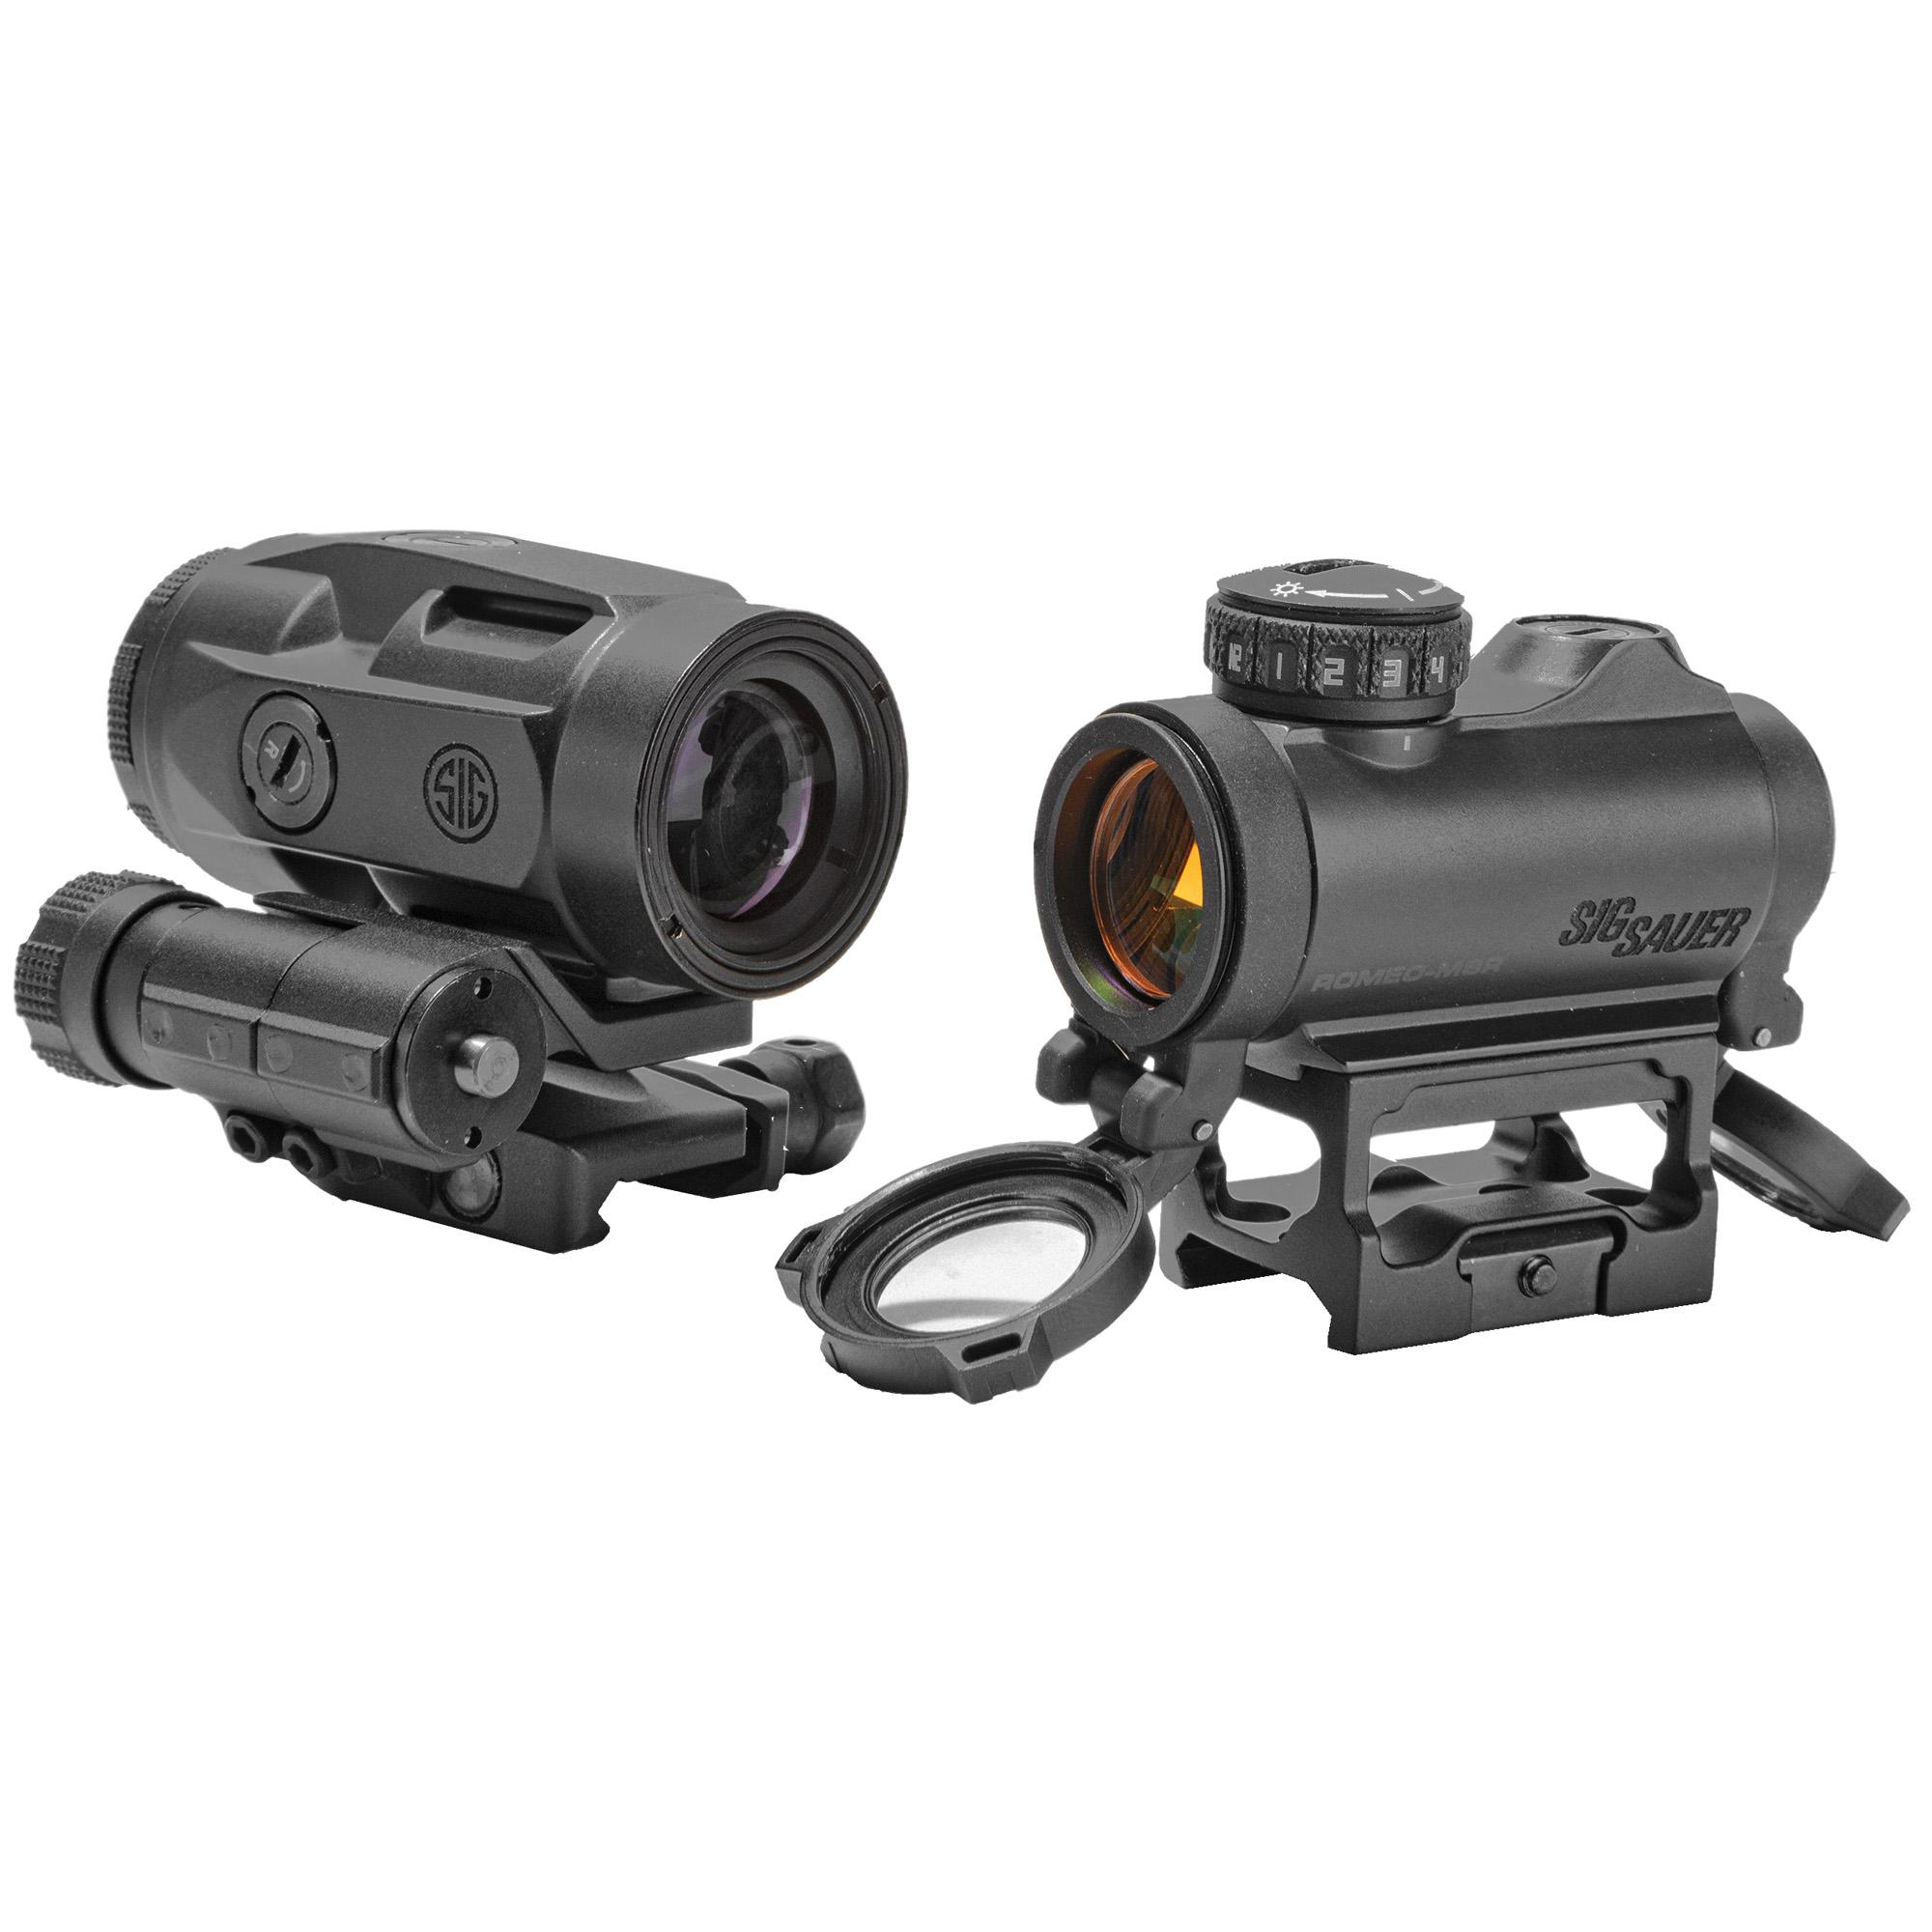 Sig Sauer Electro-Optics SORJ72001 Romeo-MSR/Juliet3 Micro Combo 1x20mm/3x20mm 2 MOA Red Dot Black